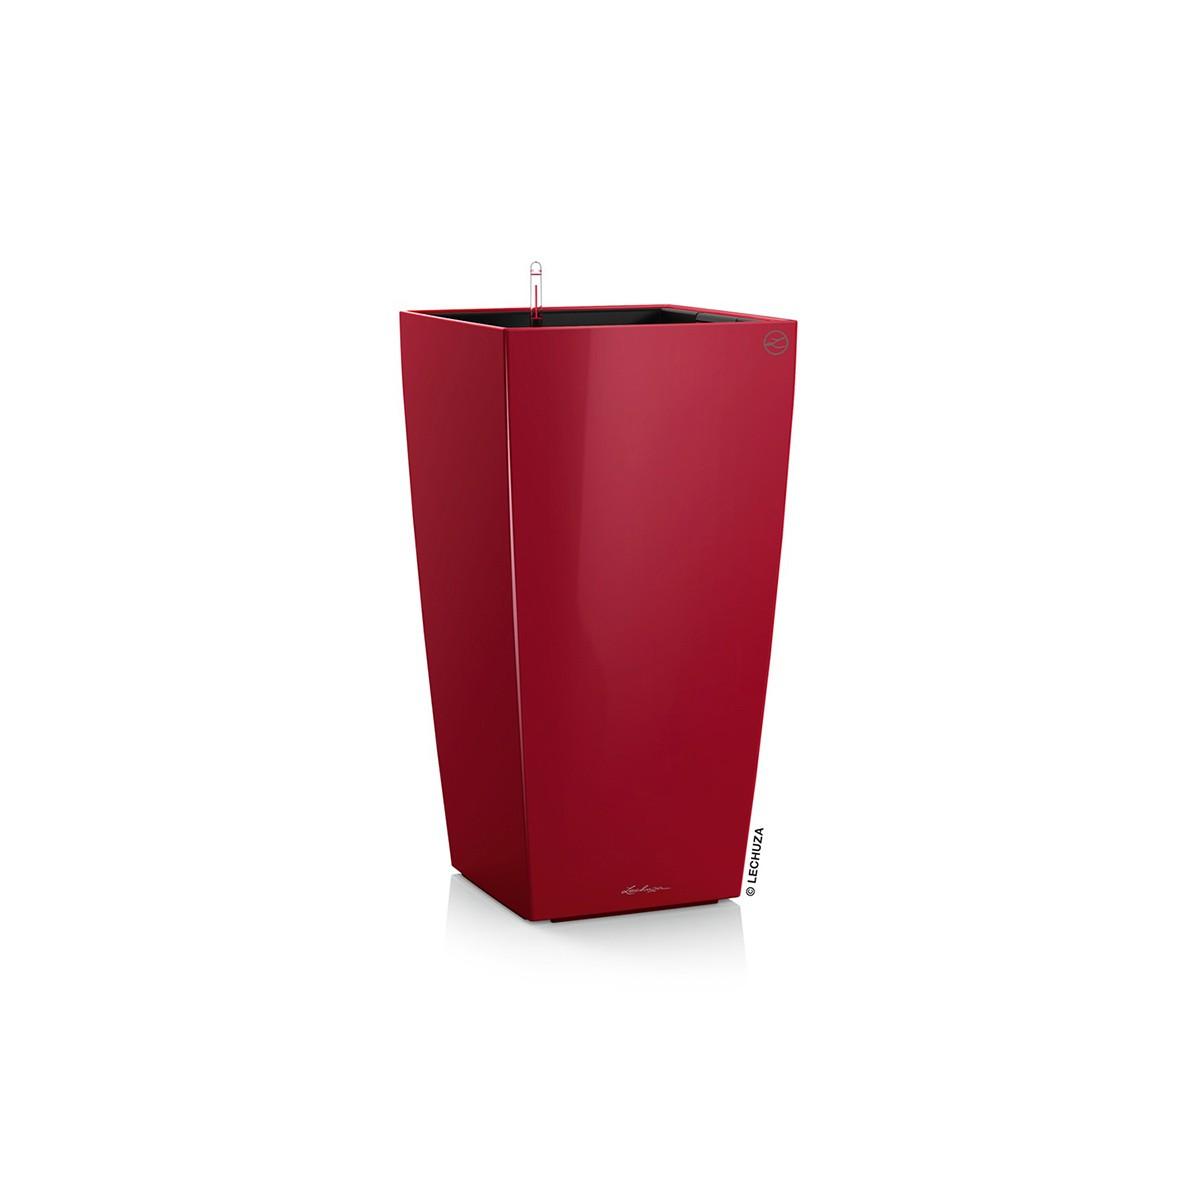 Vaso Alto Cubico Premium Rosso Lechuza